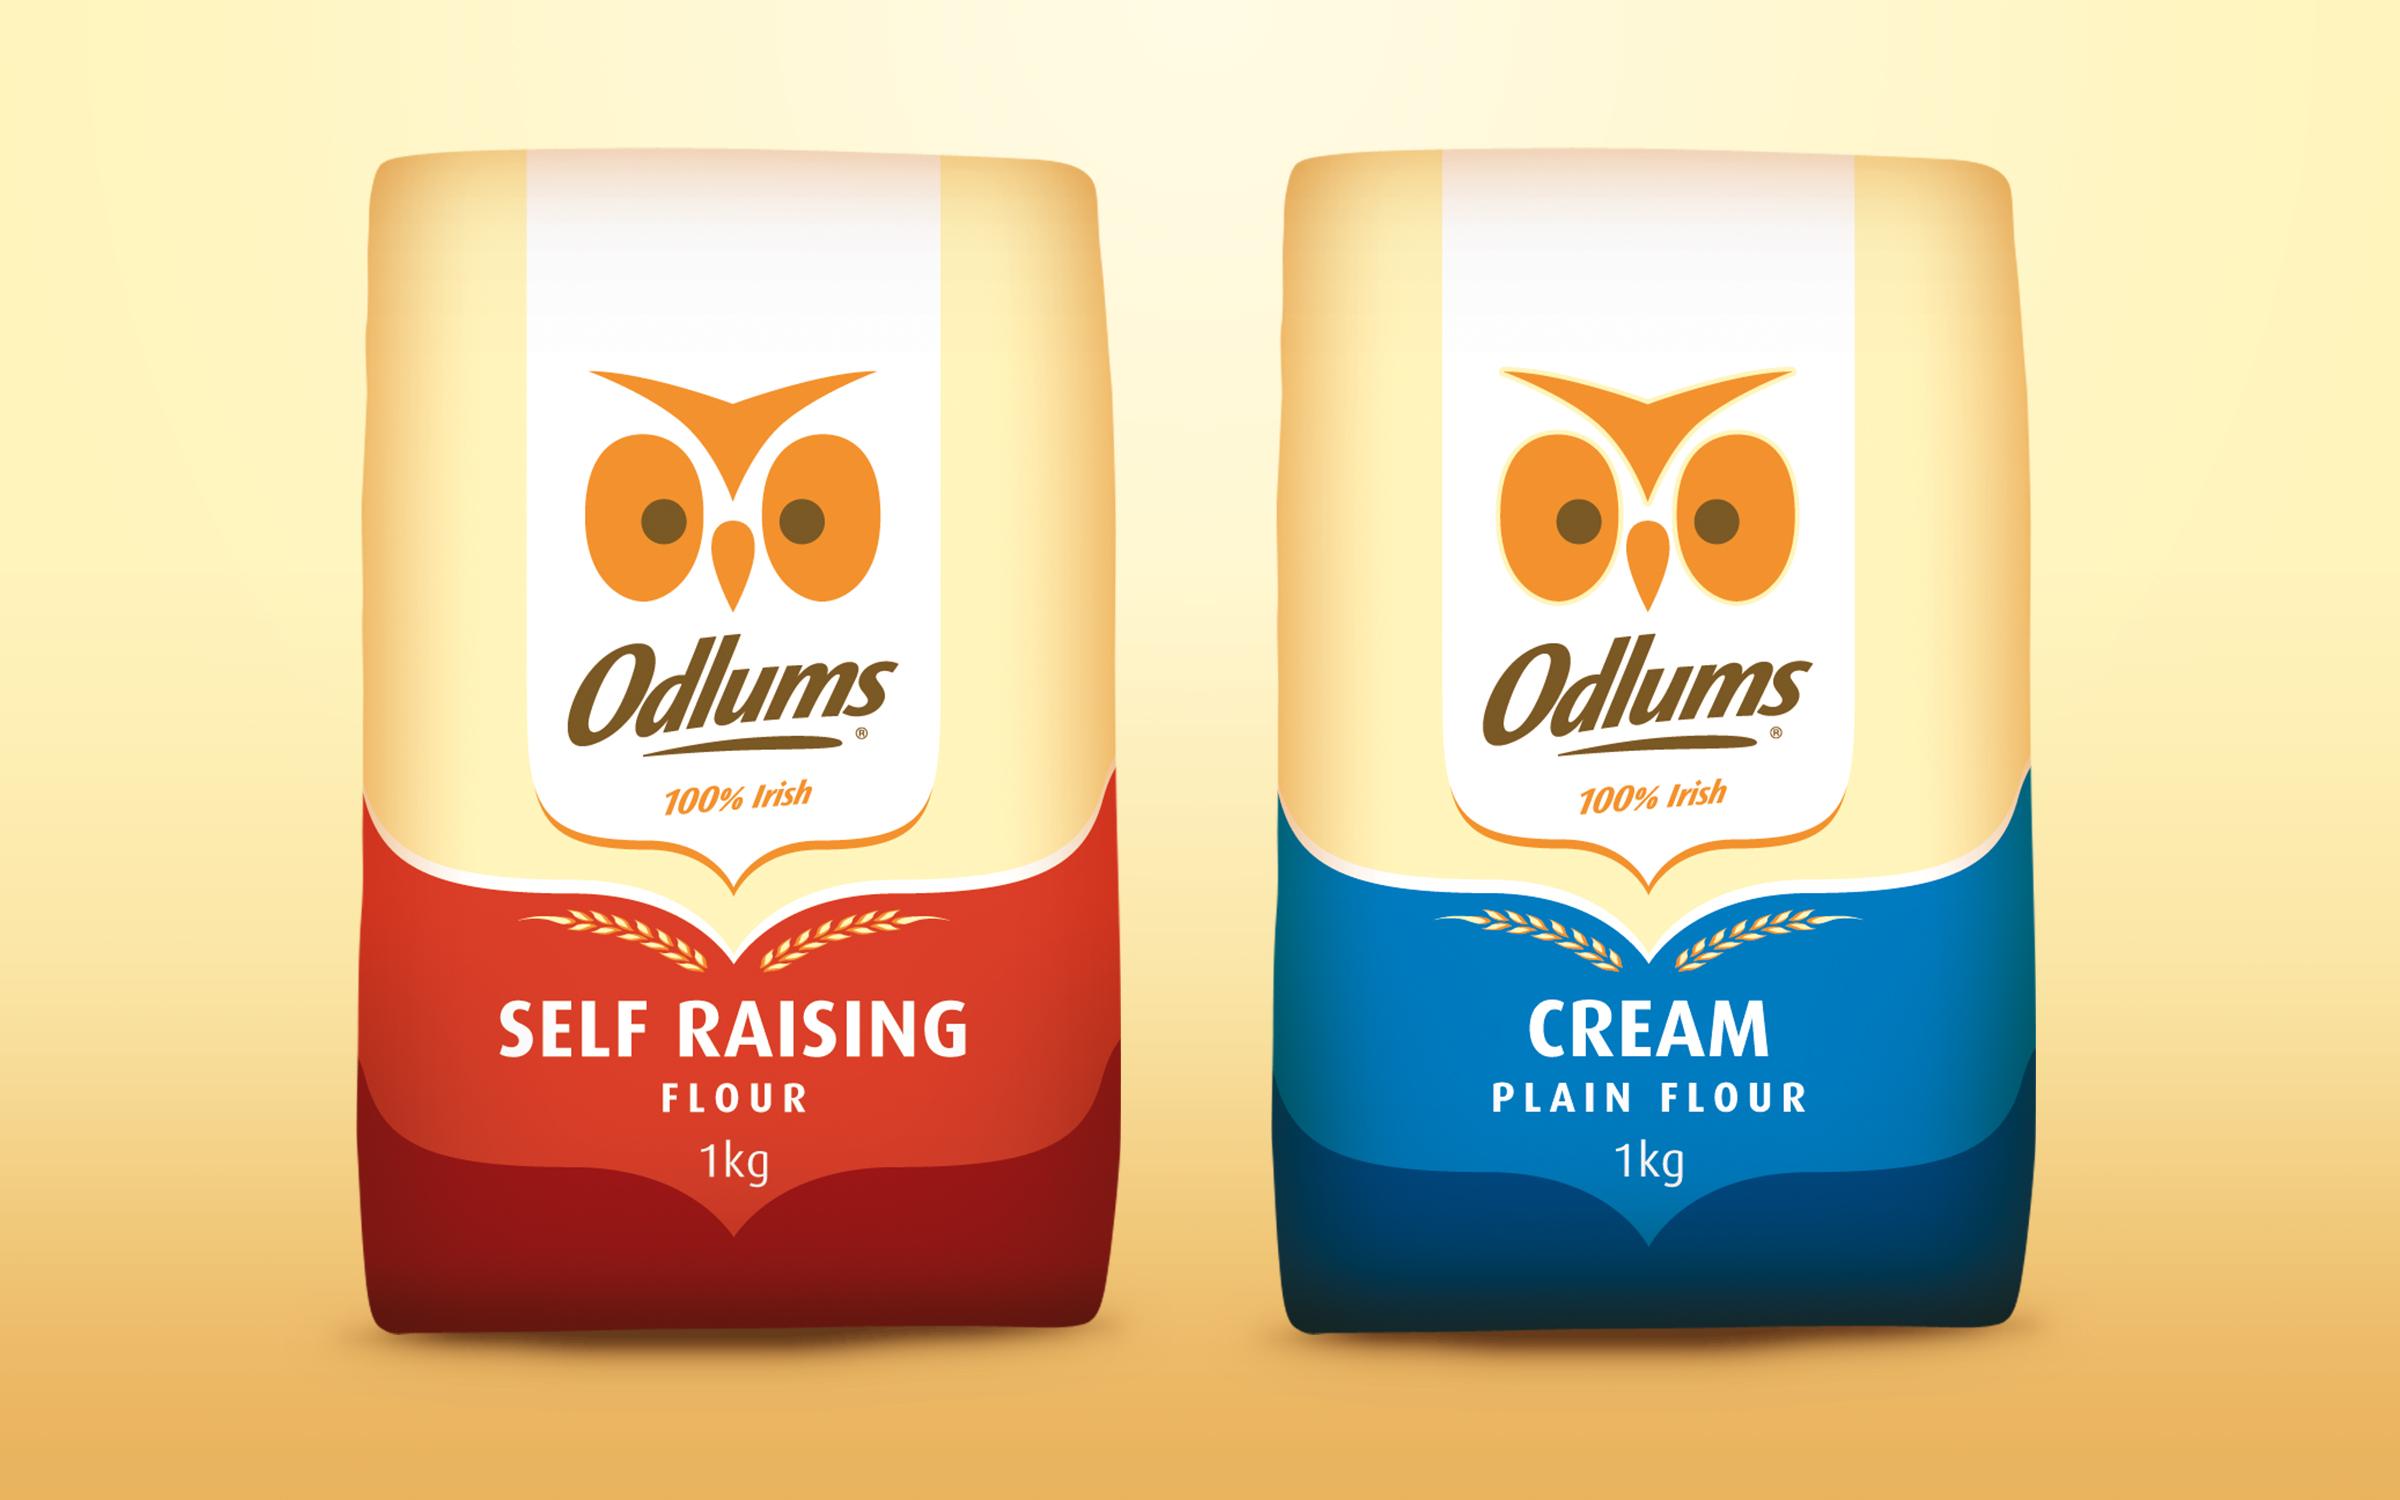 Odlums Packaging Design System